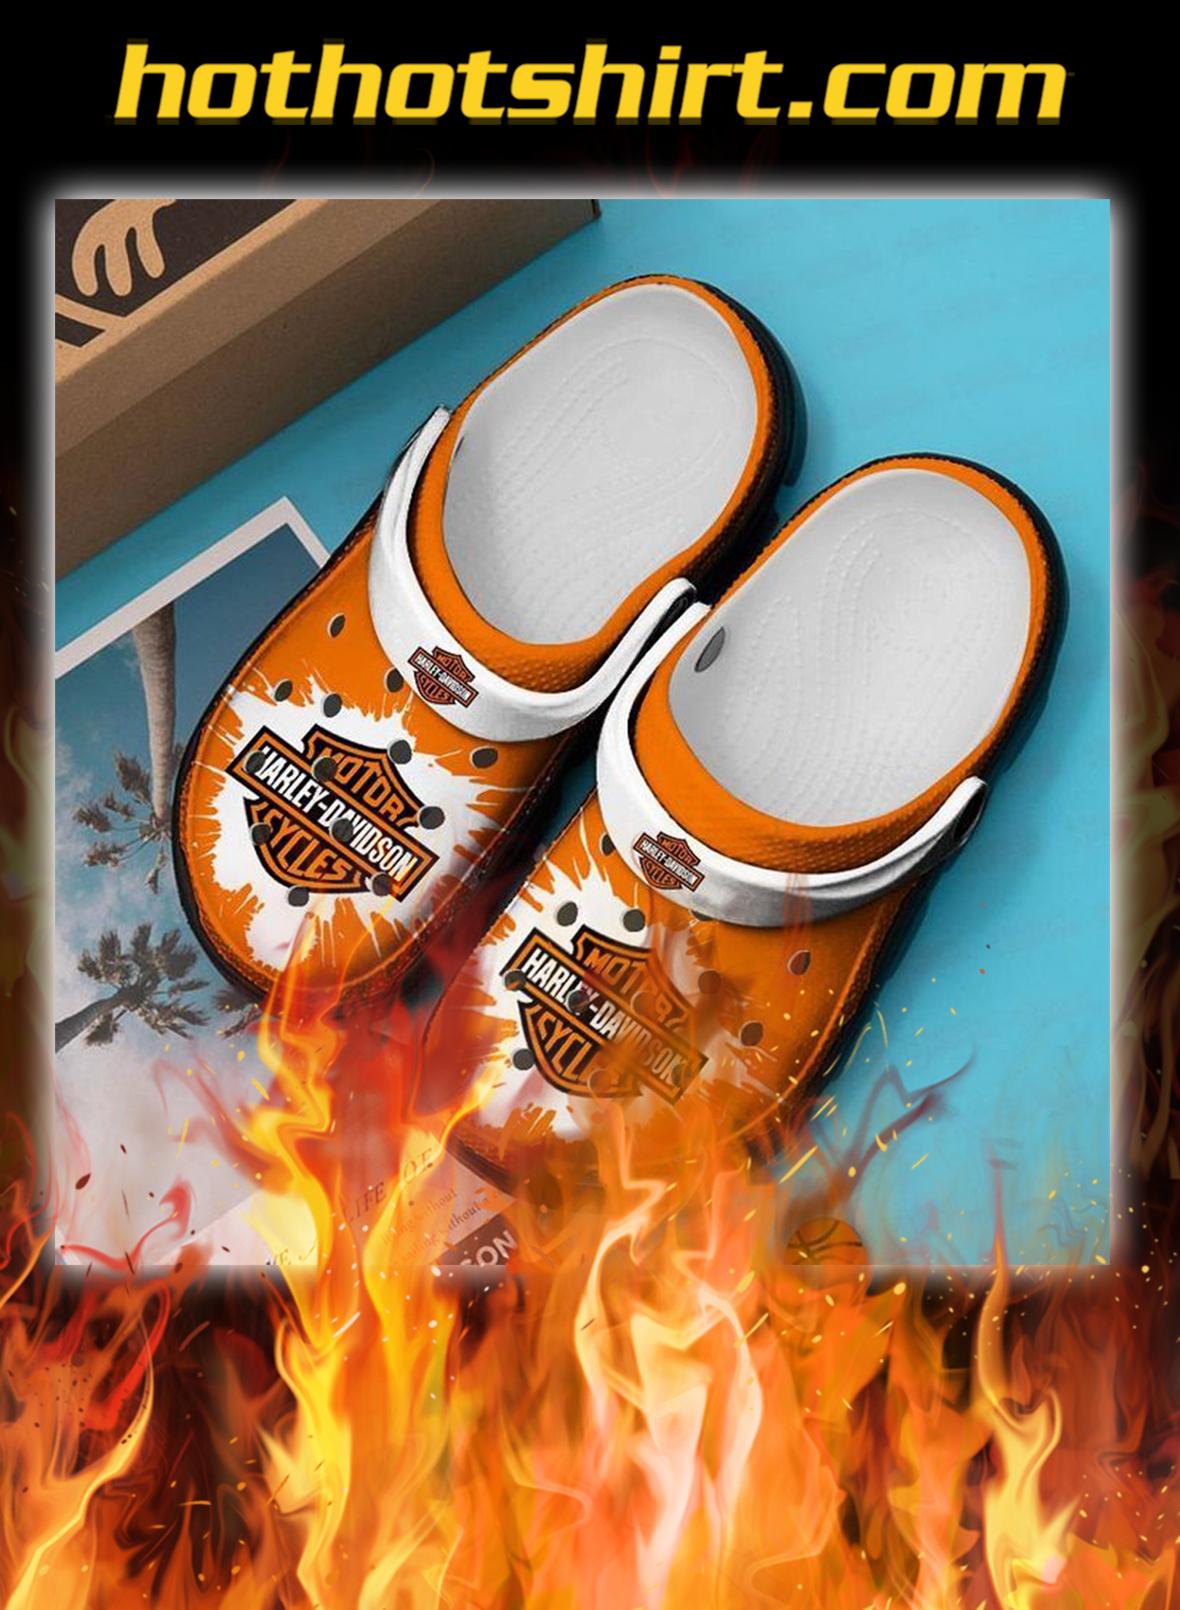 Harley davidson motorcycle crocband crocs shoes- pic 1